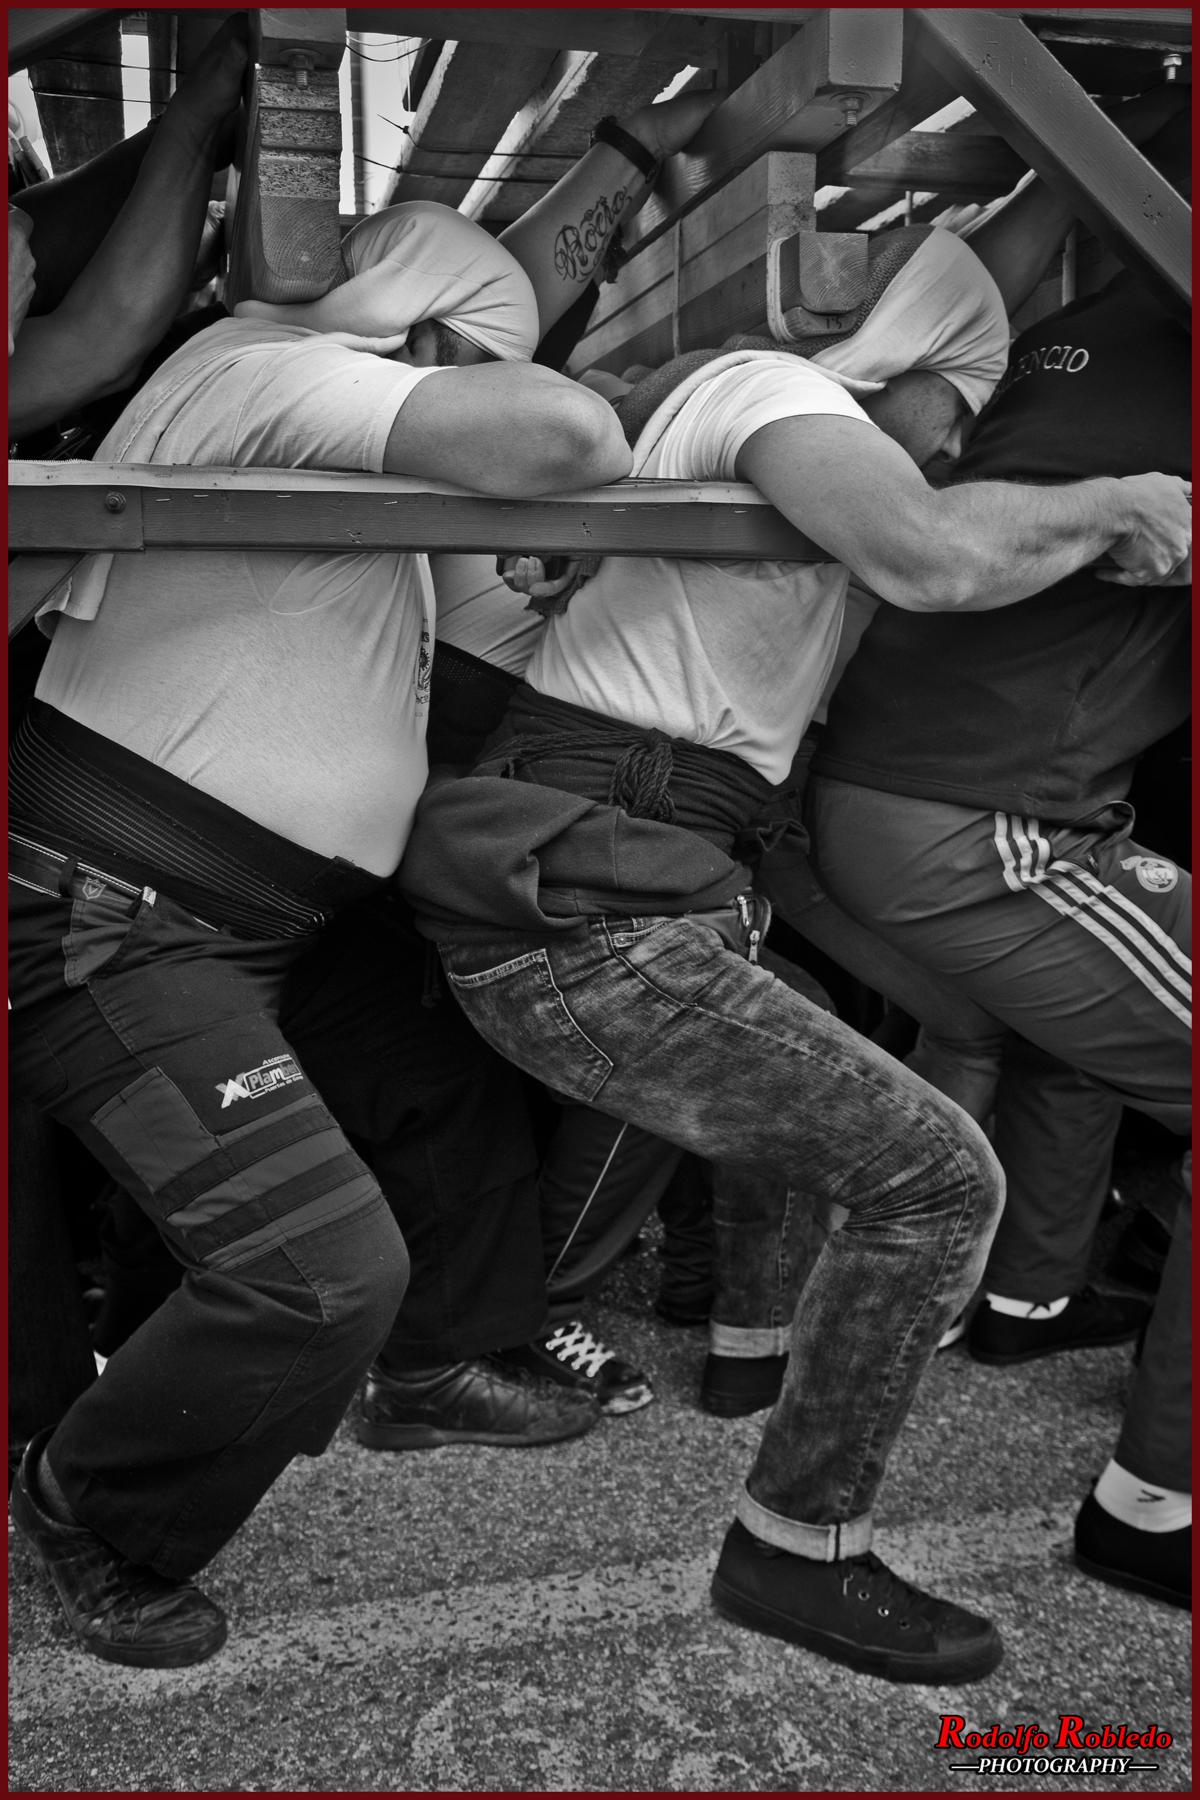 ENSAYO COSTALEROS 20016 - Rodolfo Robledo 07/02/2016 12